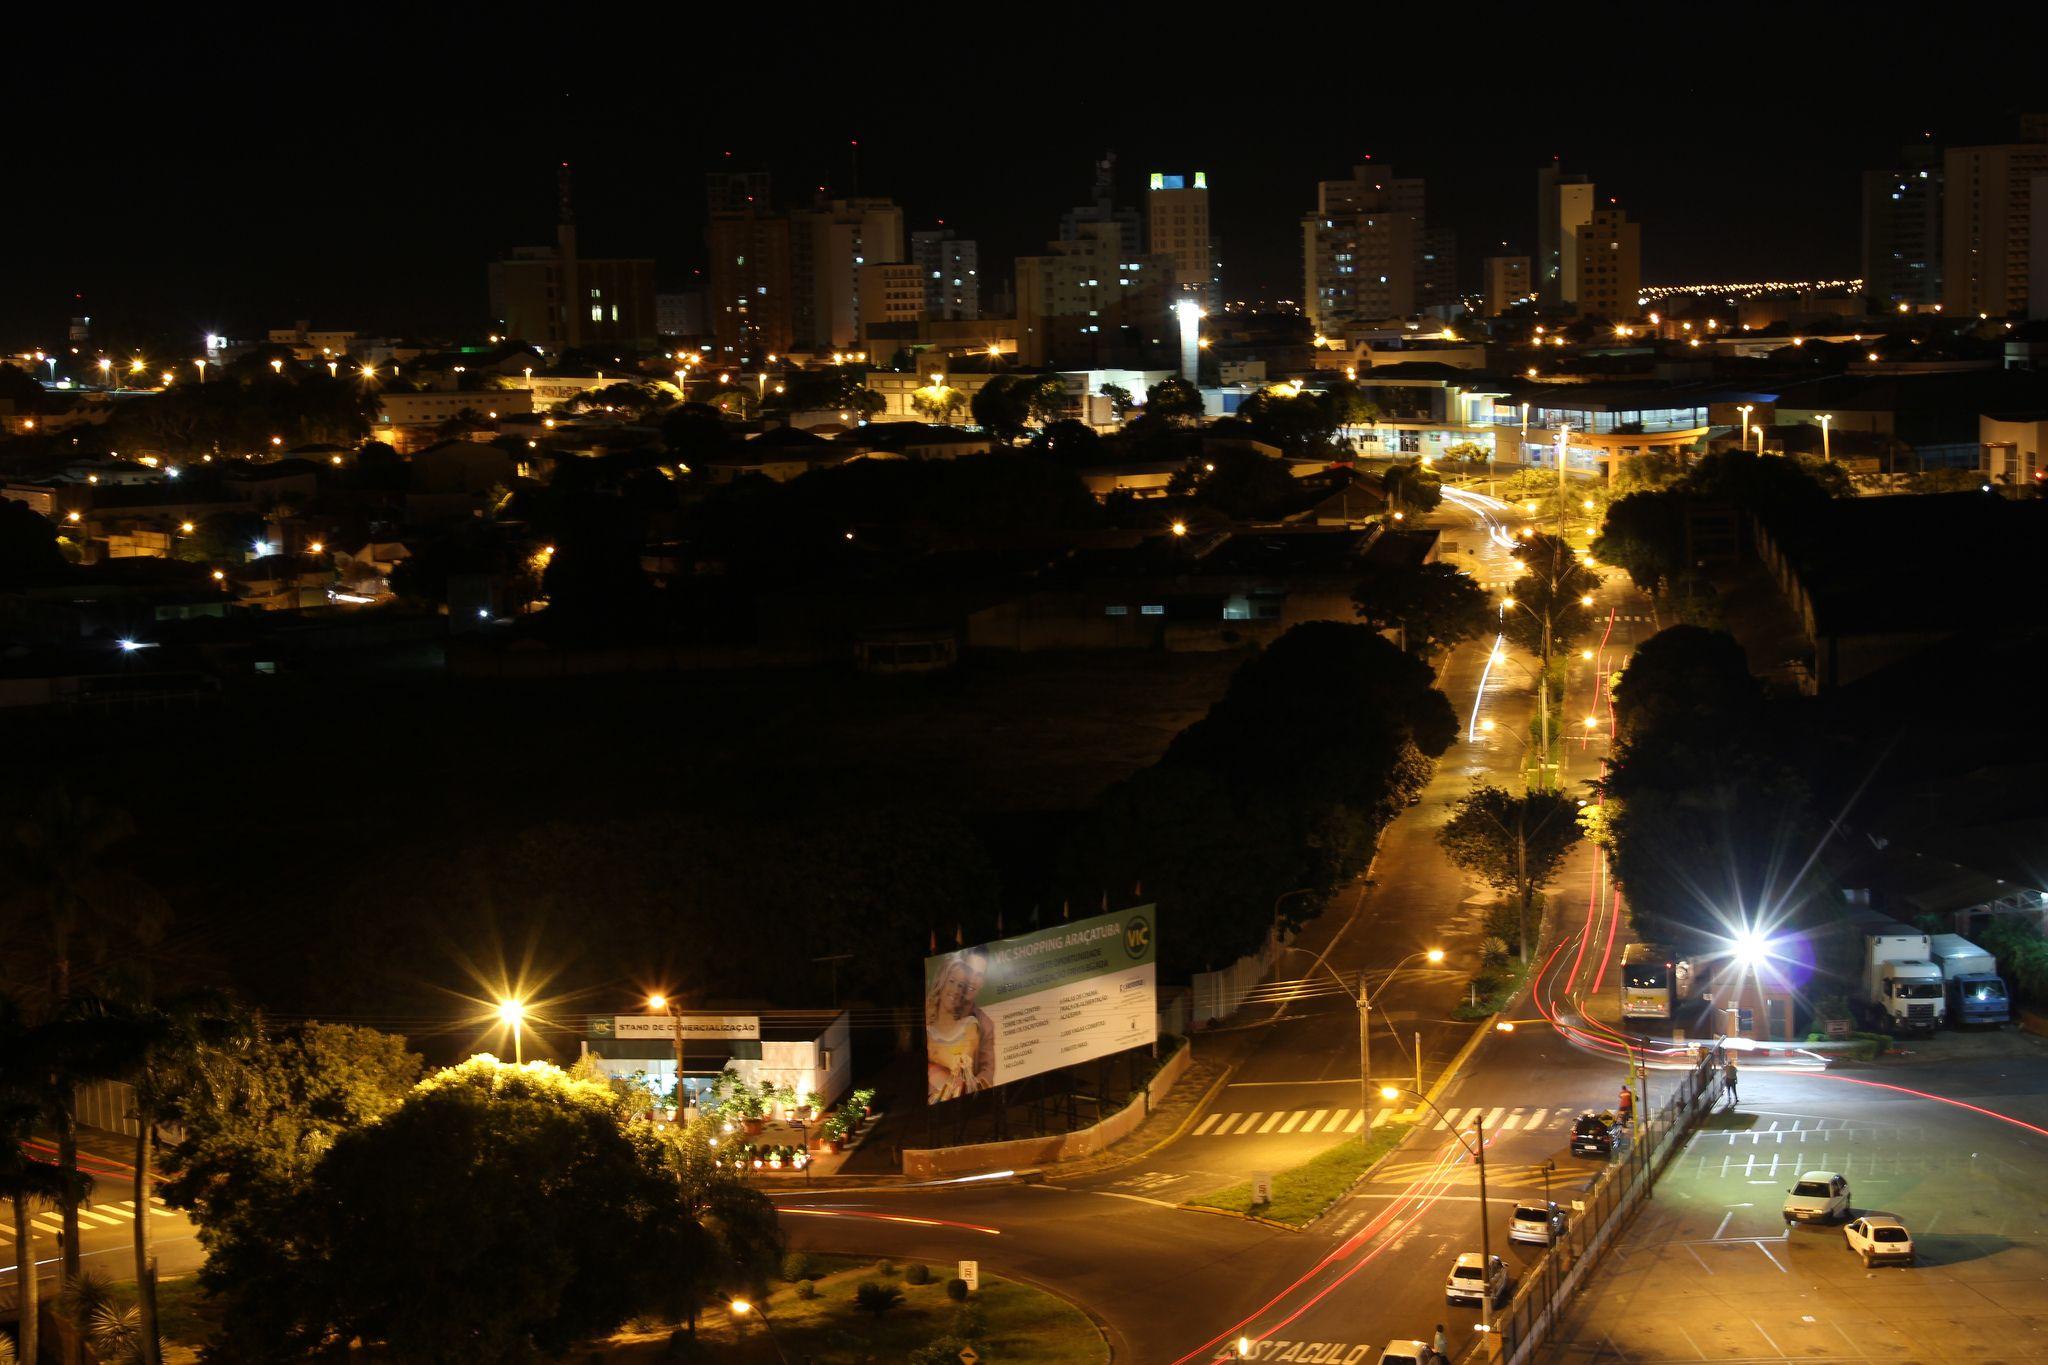 https://flic.kr/p/ed9cAf | Araçatuba Night | Click noturno para o centro de Araçatuba.